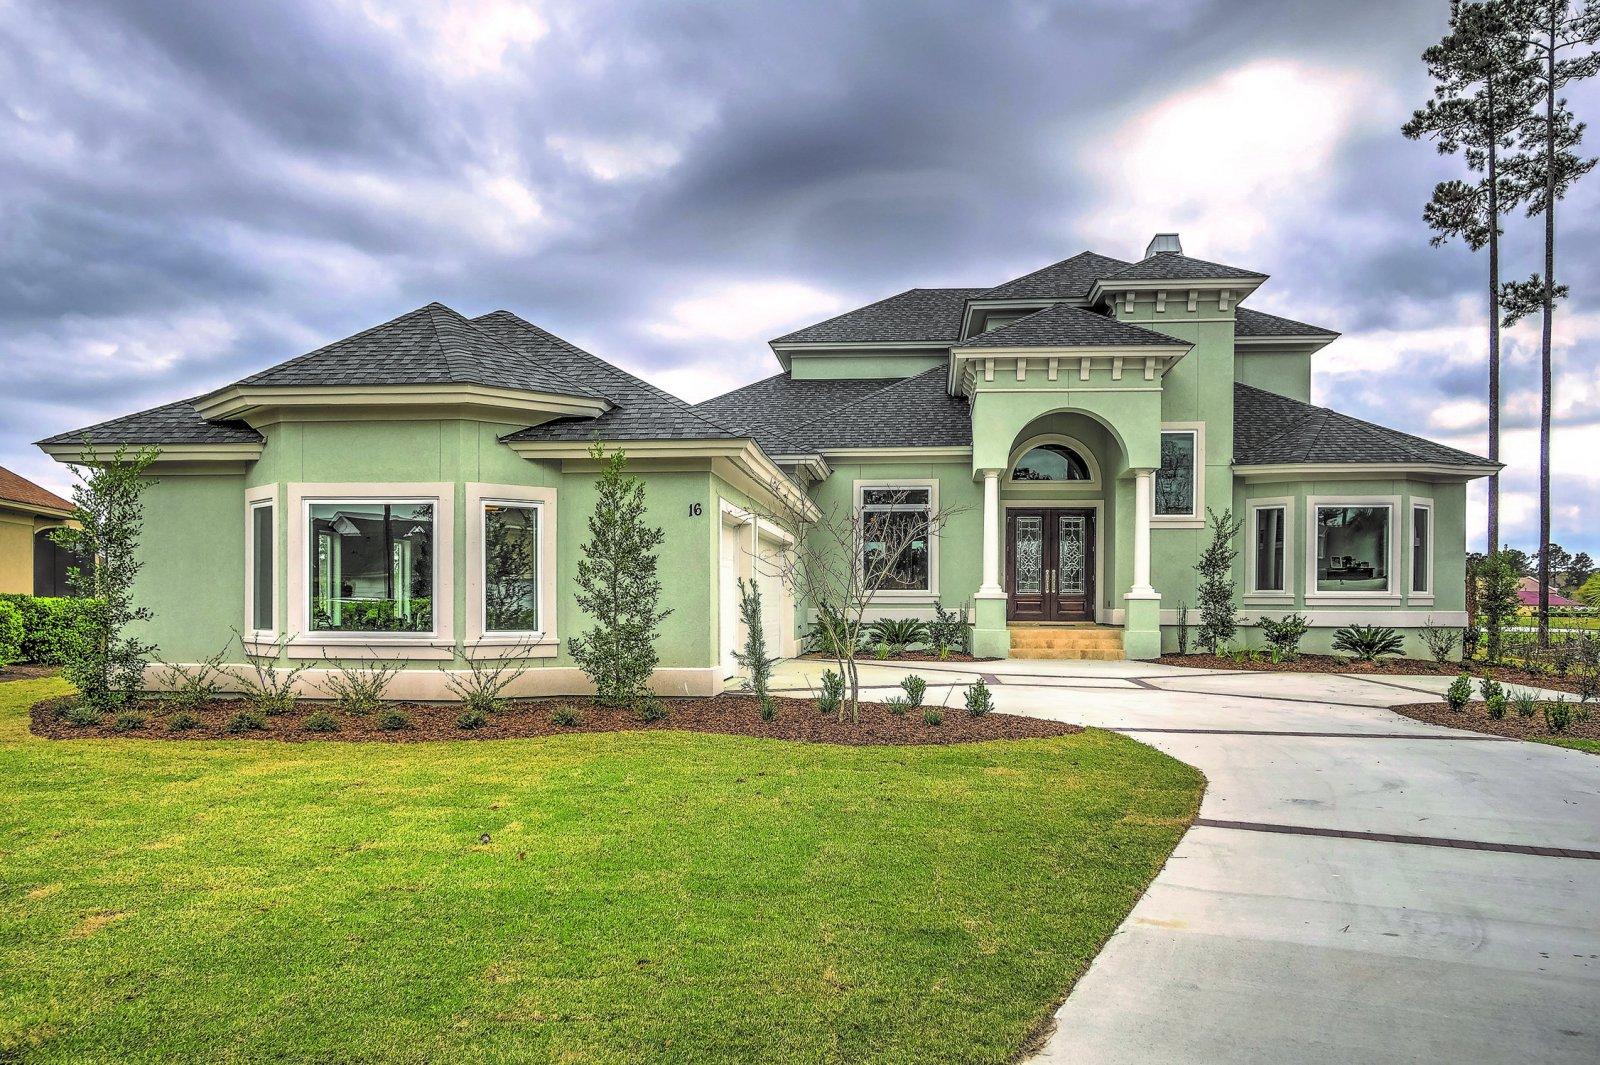 Buy A House In Hilton Head Island